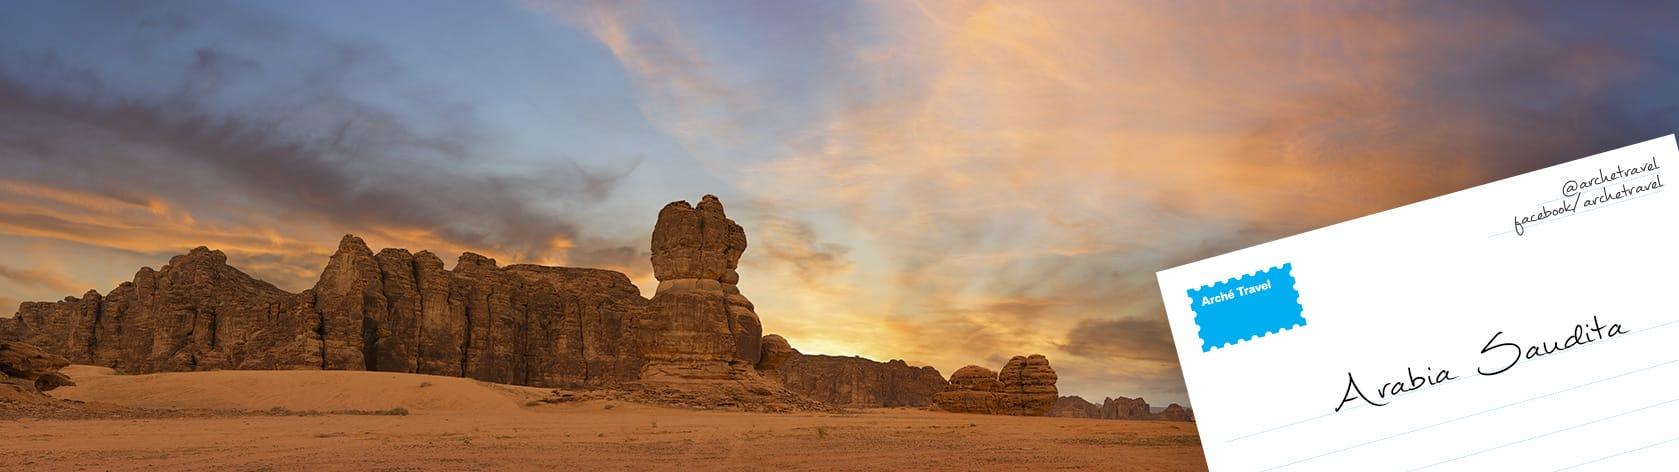 Blog Arabia Saudita - Guida di Viaggio Arabia Saudita - Blog di Viaggio Arabia Saudita